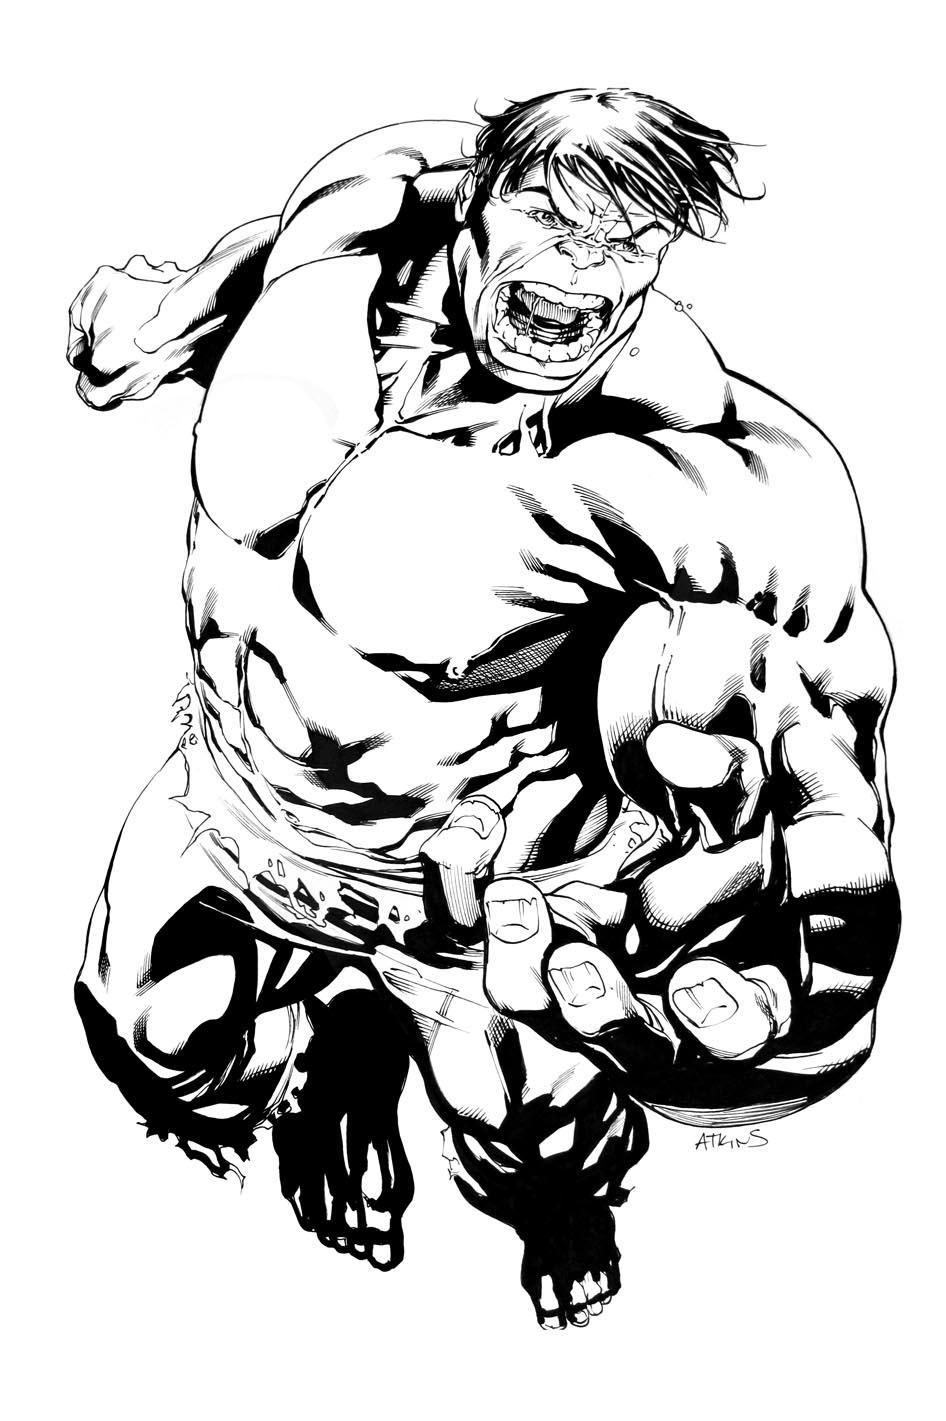 946x1421 Hulk Smash .again! Robert Atkins Art